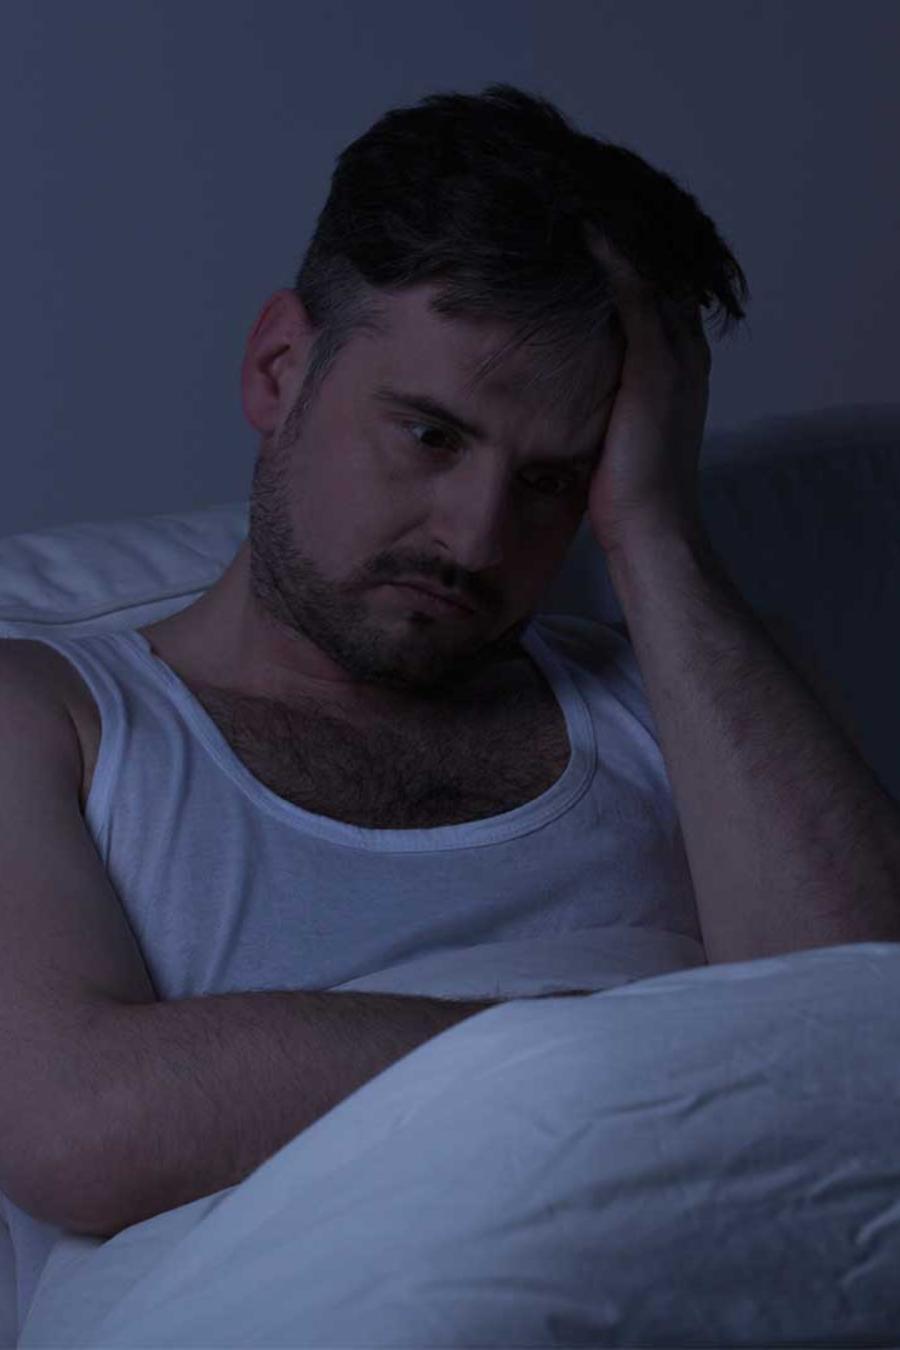 evita alimentos antes dormir